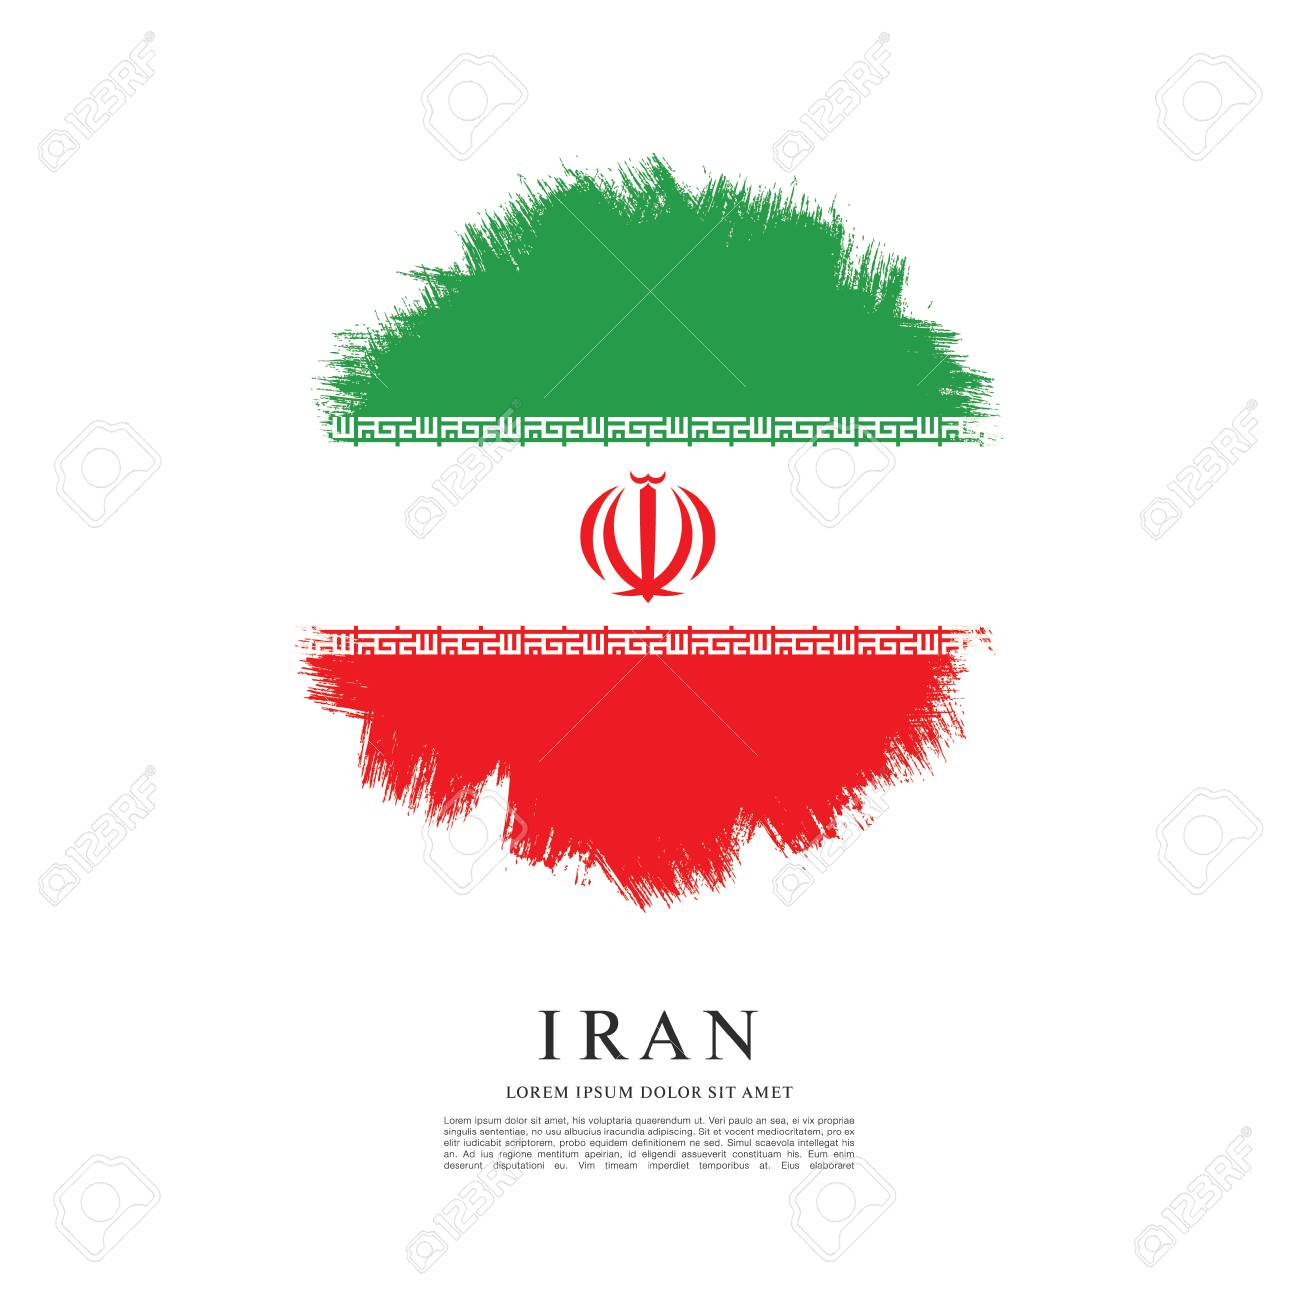 Flag of iran brush stroke background royalty free cliparts vectors flag of iran brush stroke background stock vector 69502703 buycottarizona Choice Image